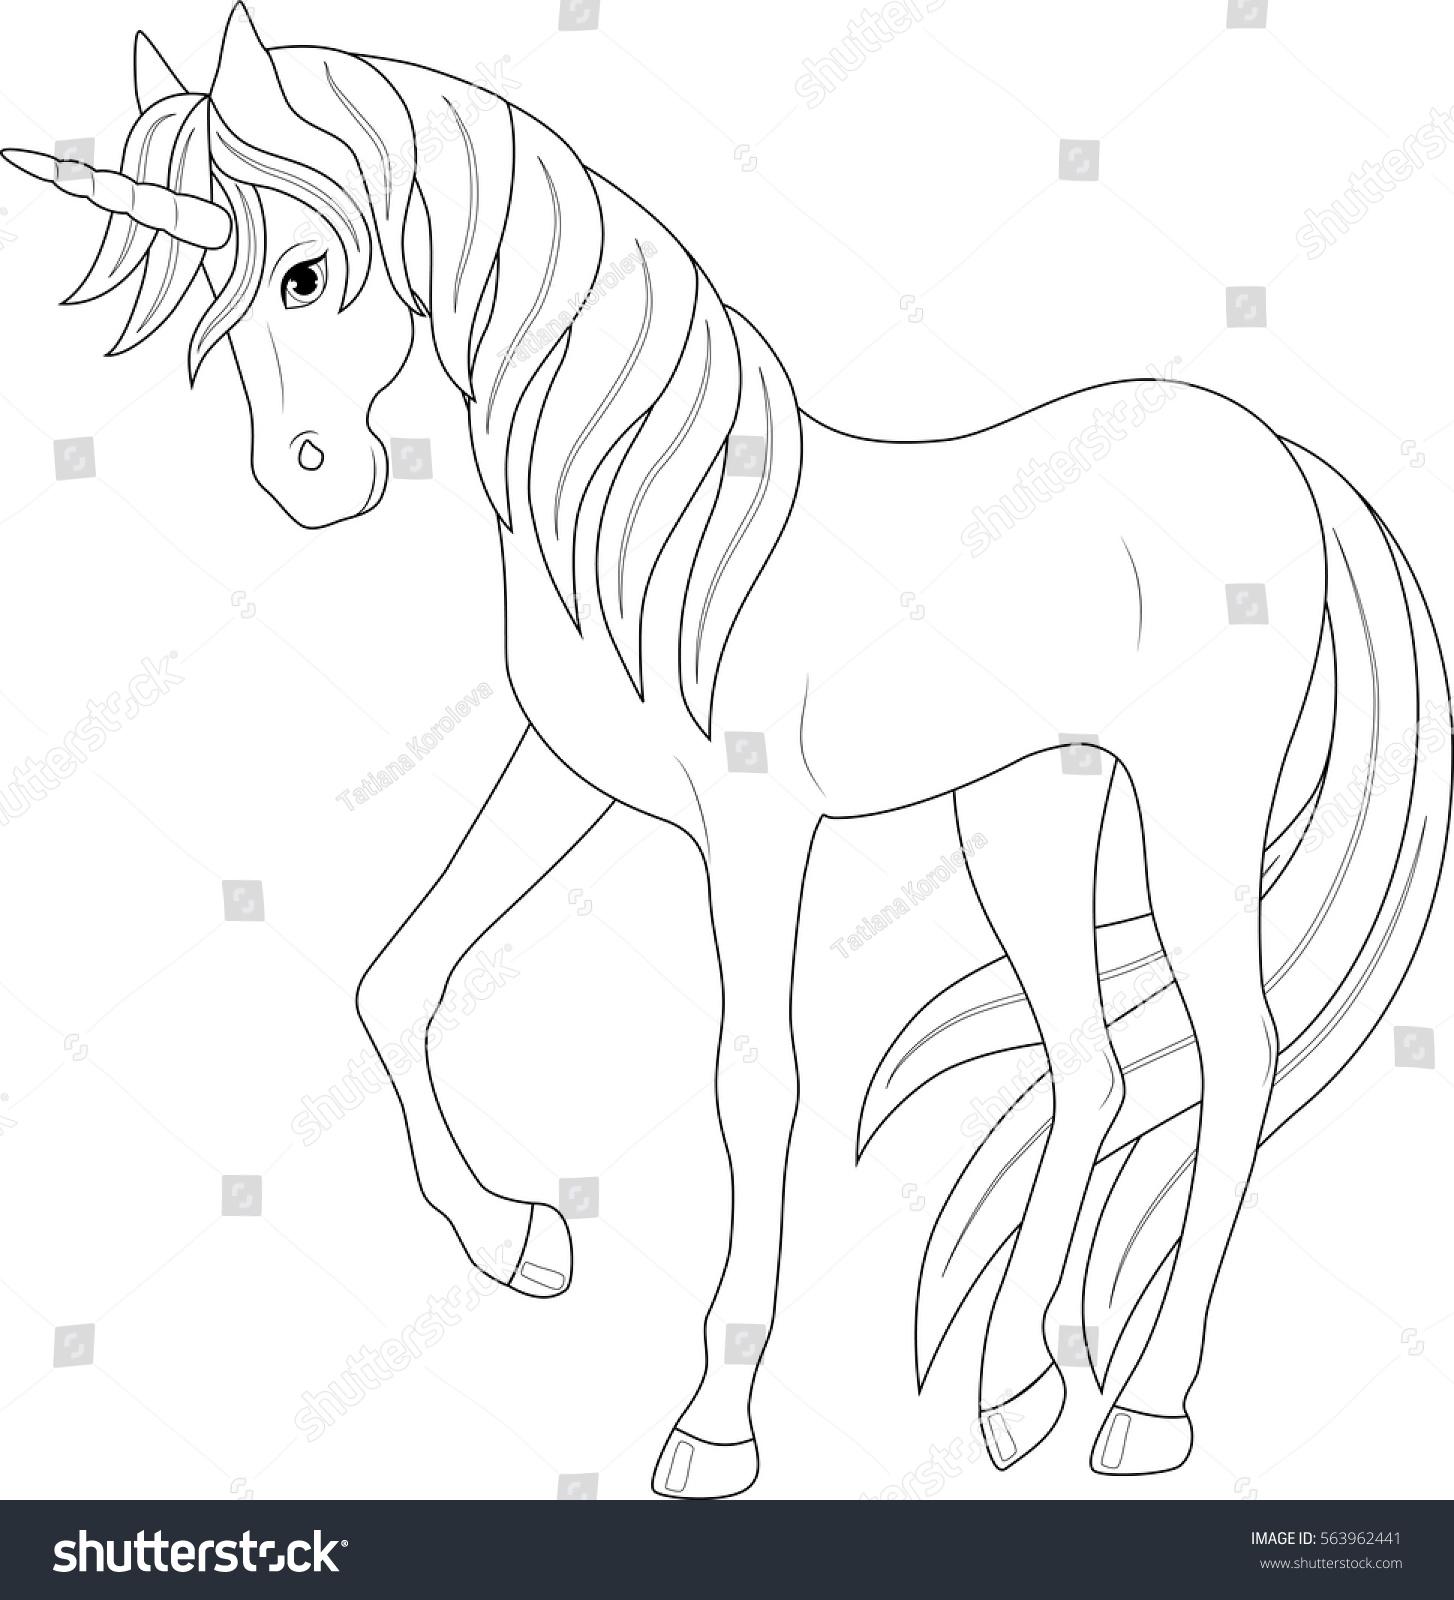 cute fairy unicorn coloring page stock vector 563962441 shutterstock